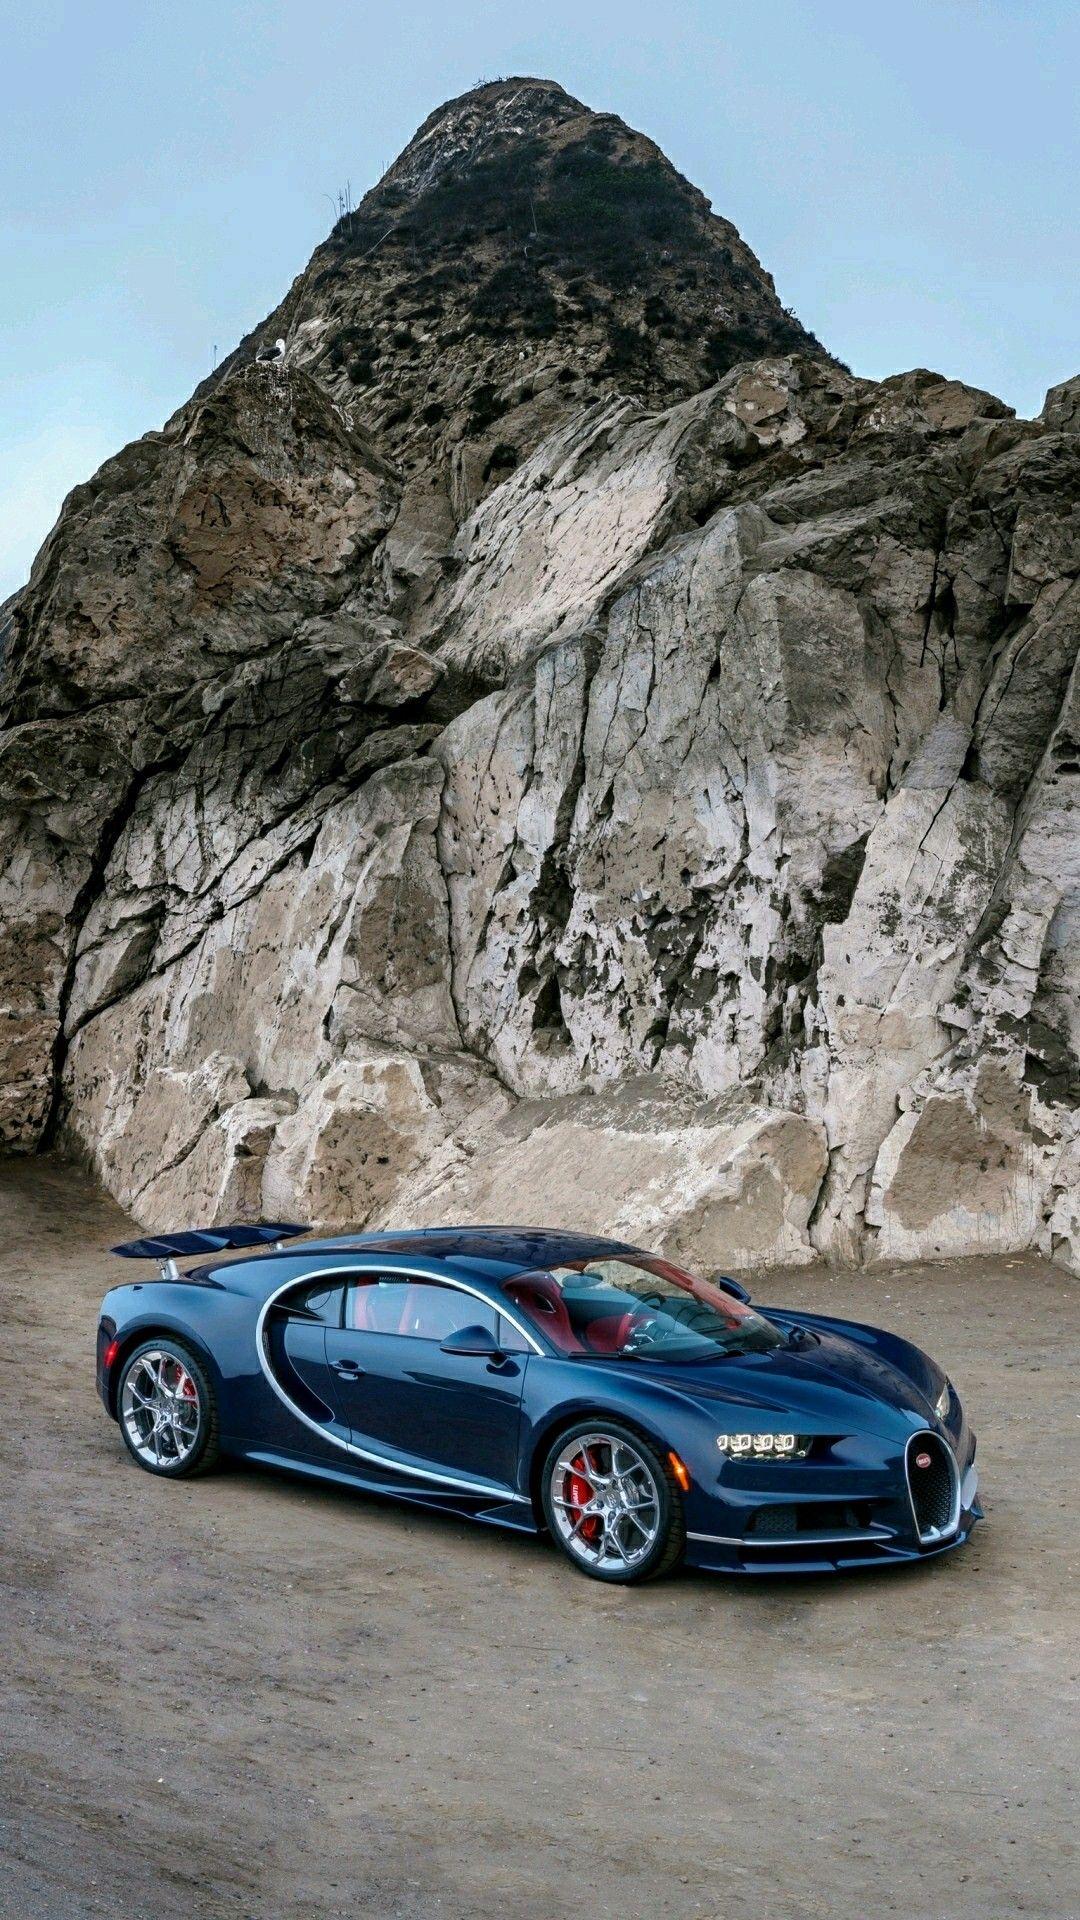 Pin By Tom Kowaliski On A Best French Cars 1 Bugatti Cars Best Luxury Cars Luxury Cars